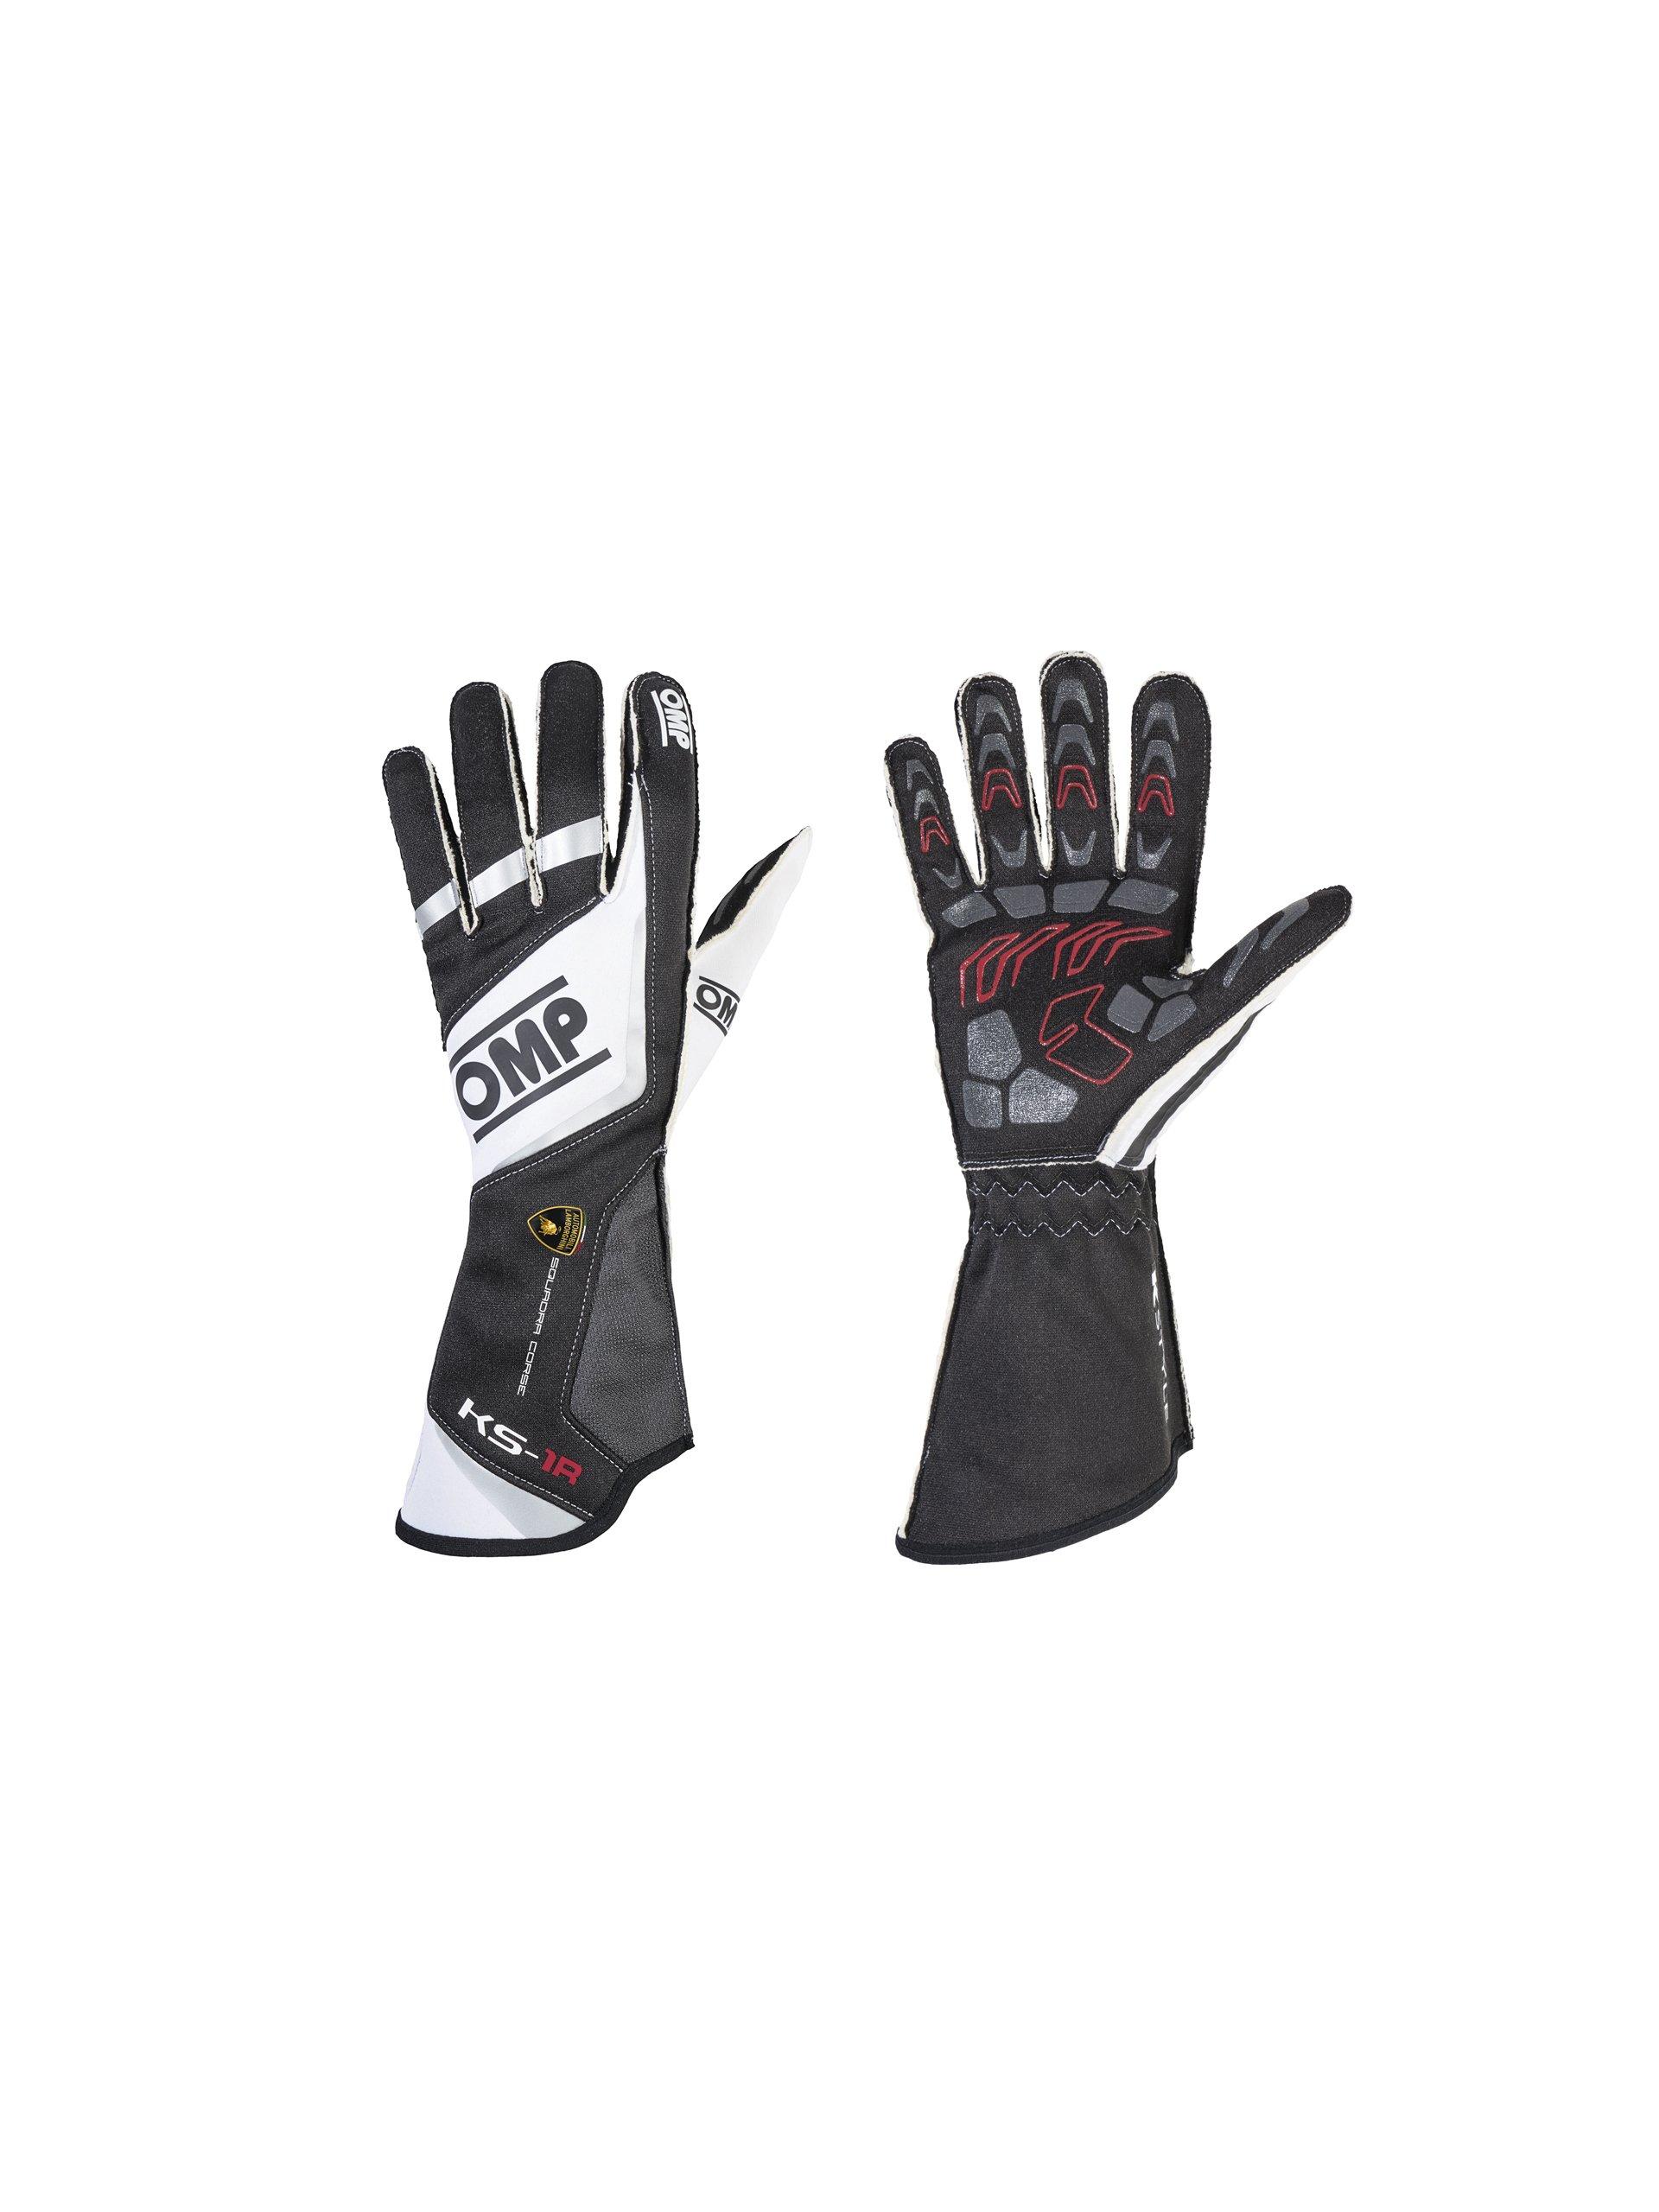 Automobili Lamborghini Accessories Kart Driver Gloves From Omp Xl Black